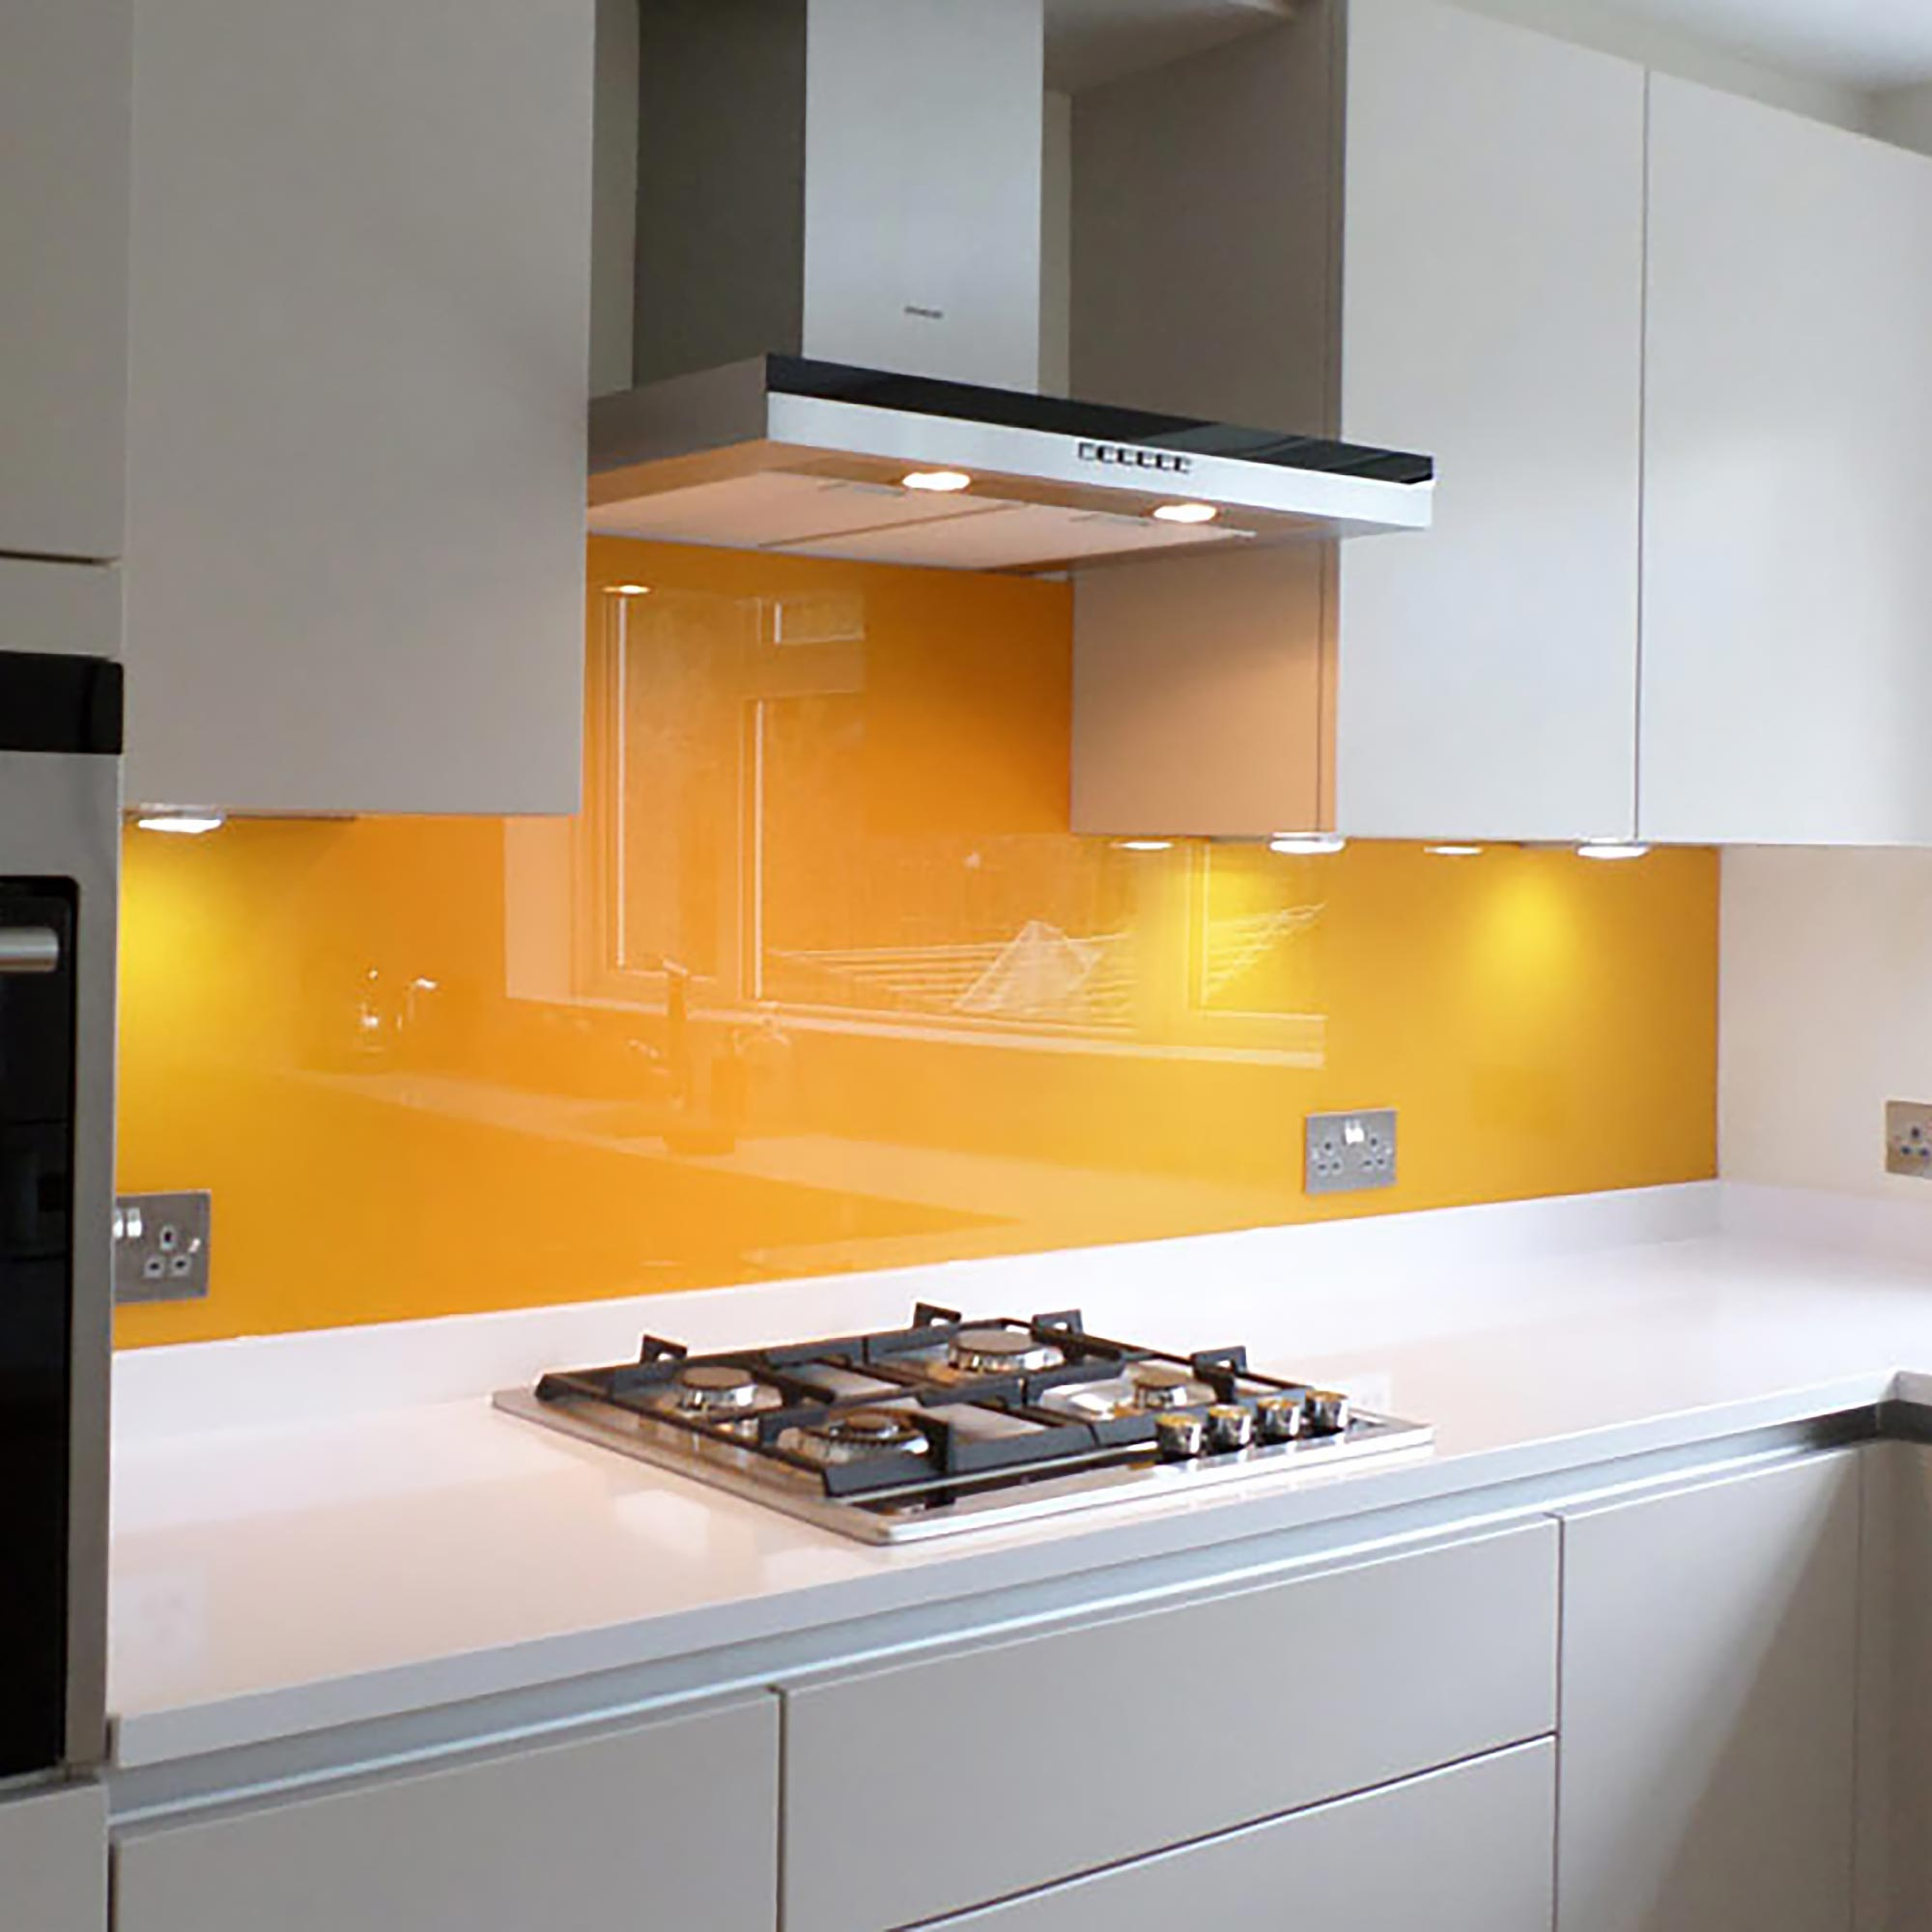 Glass kitchen splashback orange/yellow